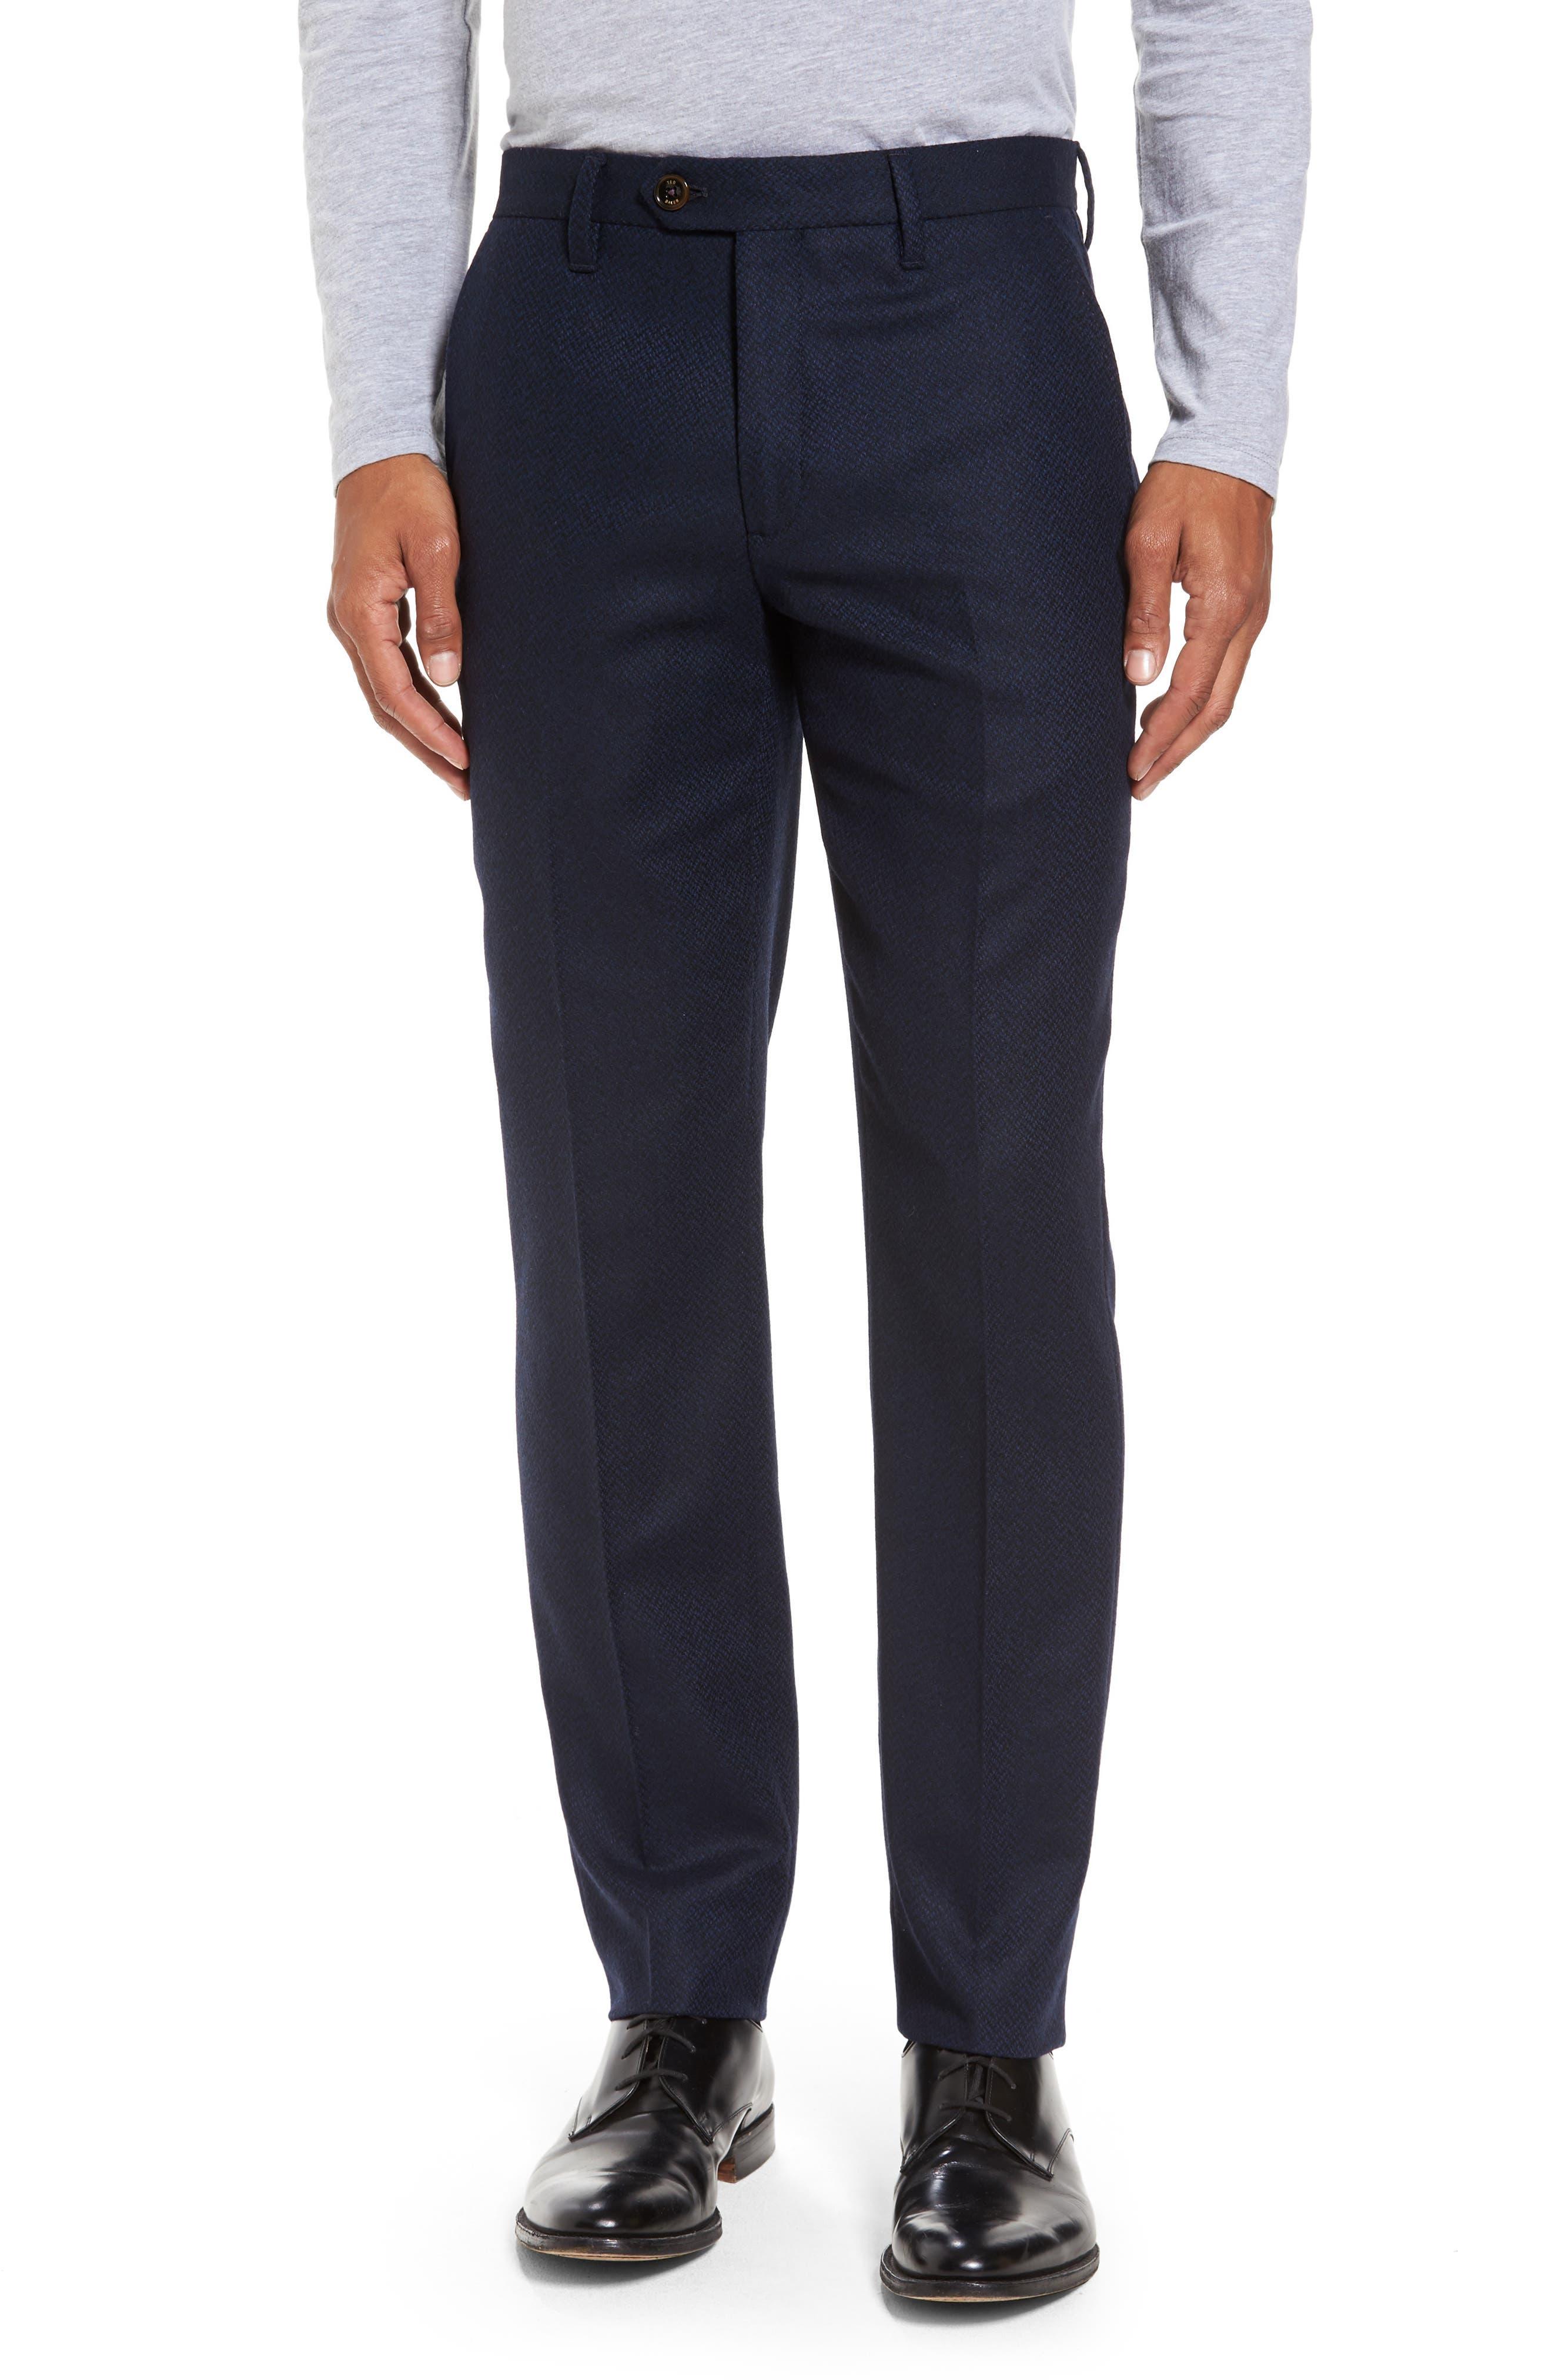 Glentro Semi Plain Wool Blend Trousers,                         Main,                         color, Navy